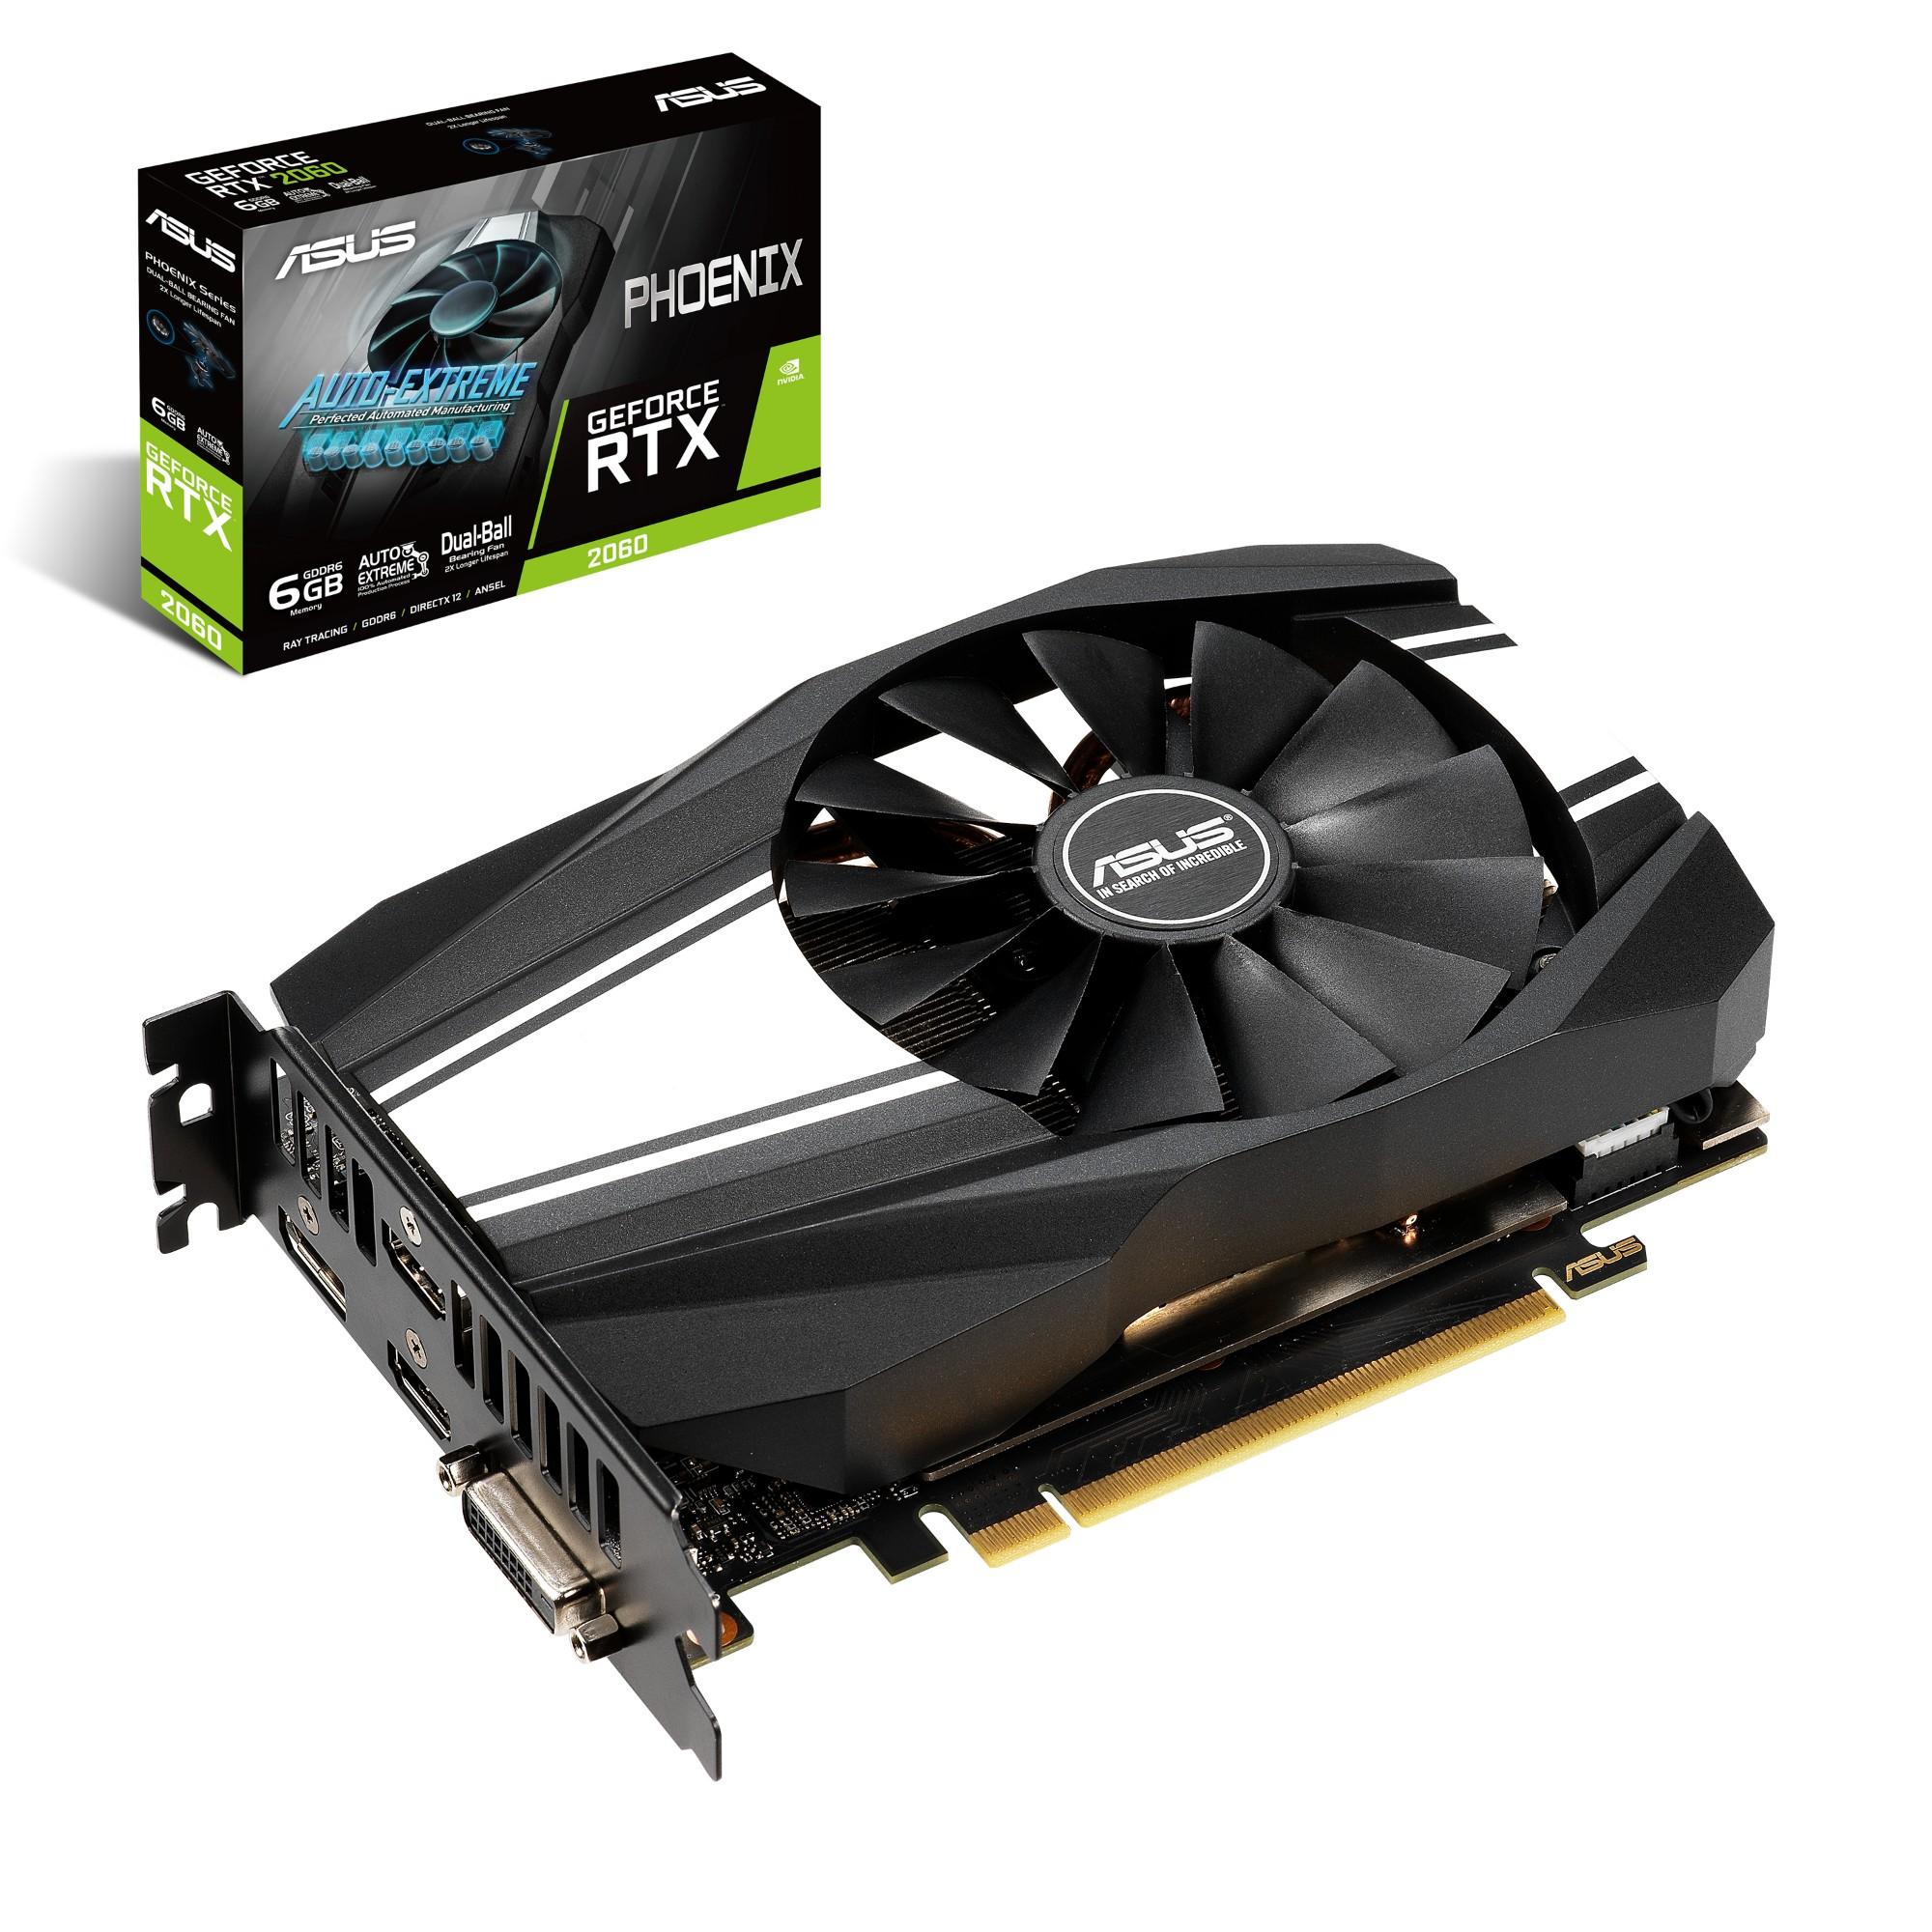 ASUS Phoenix PH-RTX2060-6G GeForce RTX 2060 6 GB GDDR6